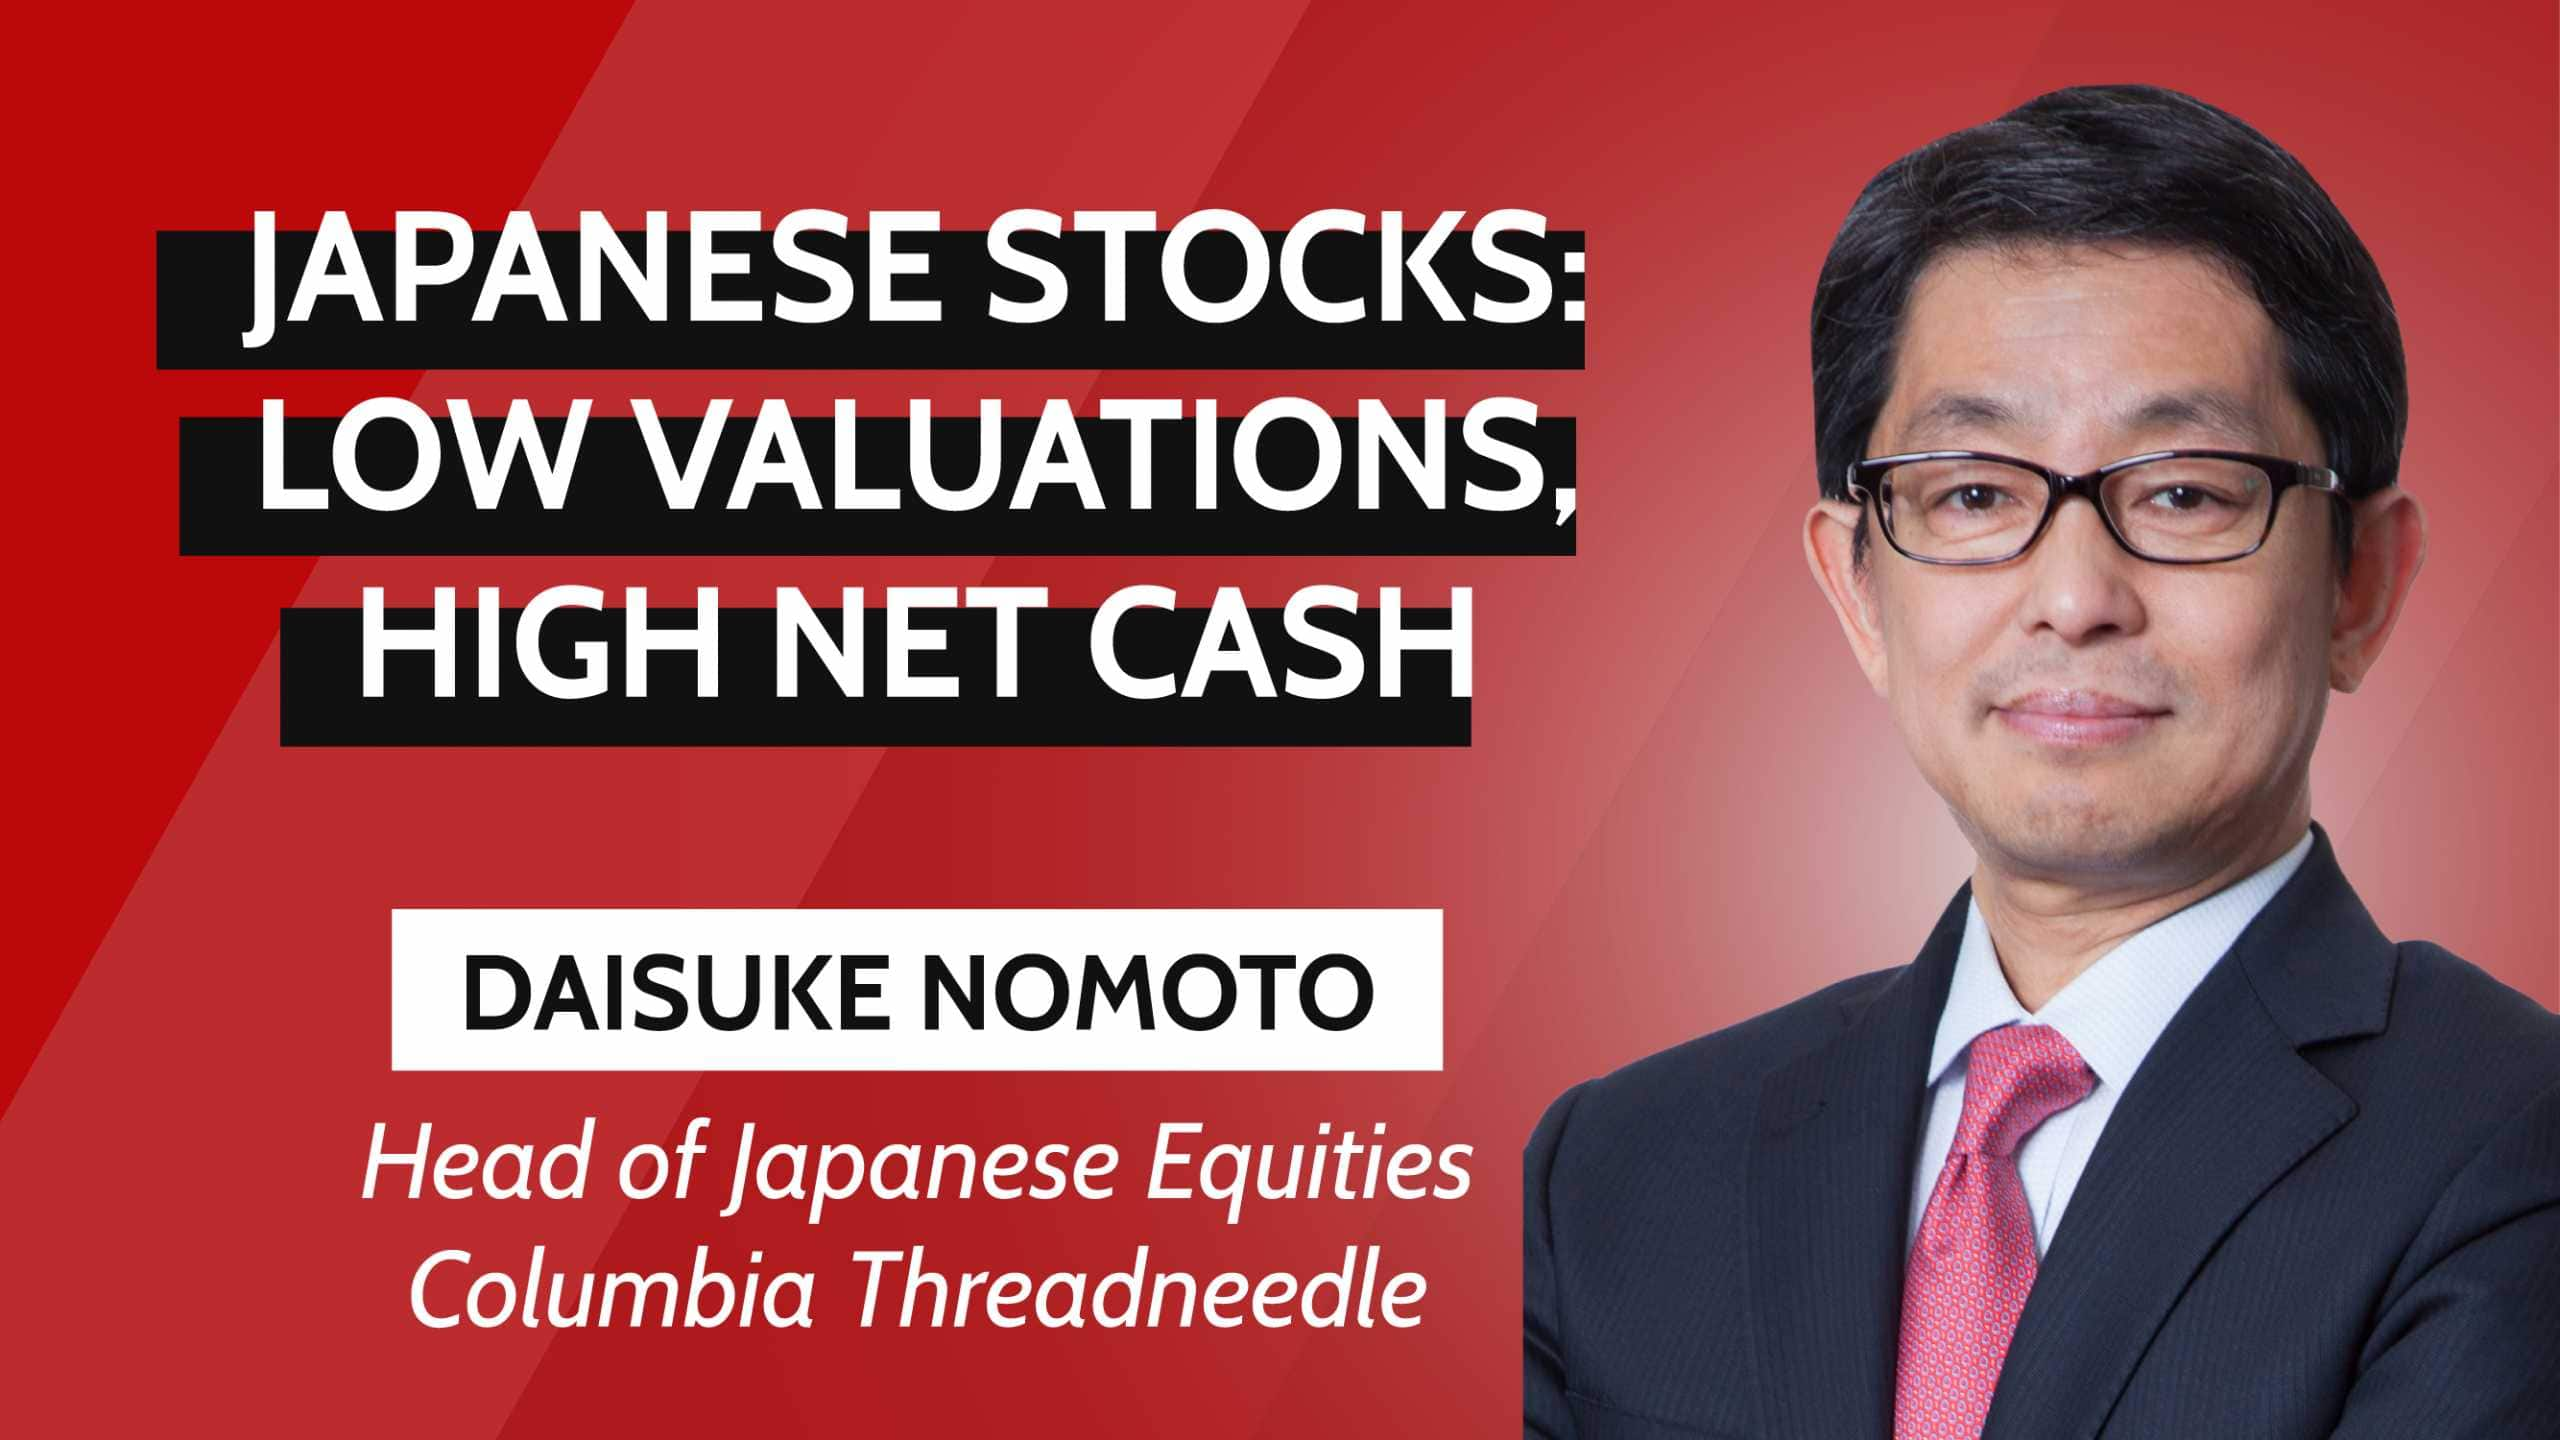 Japanische Aktien